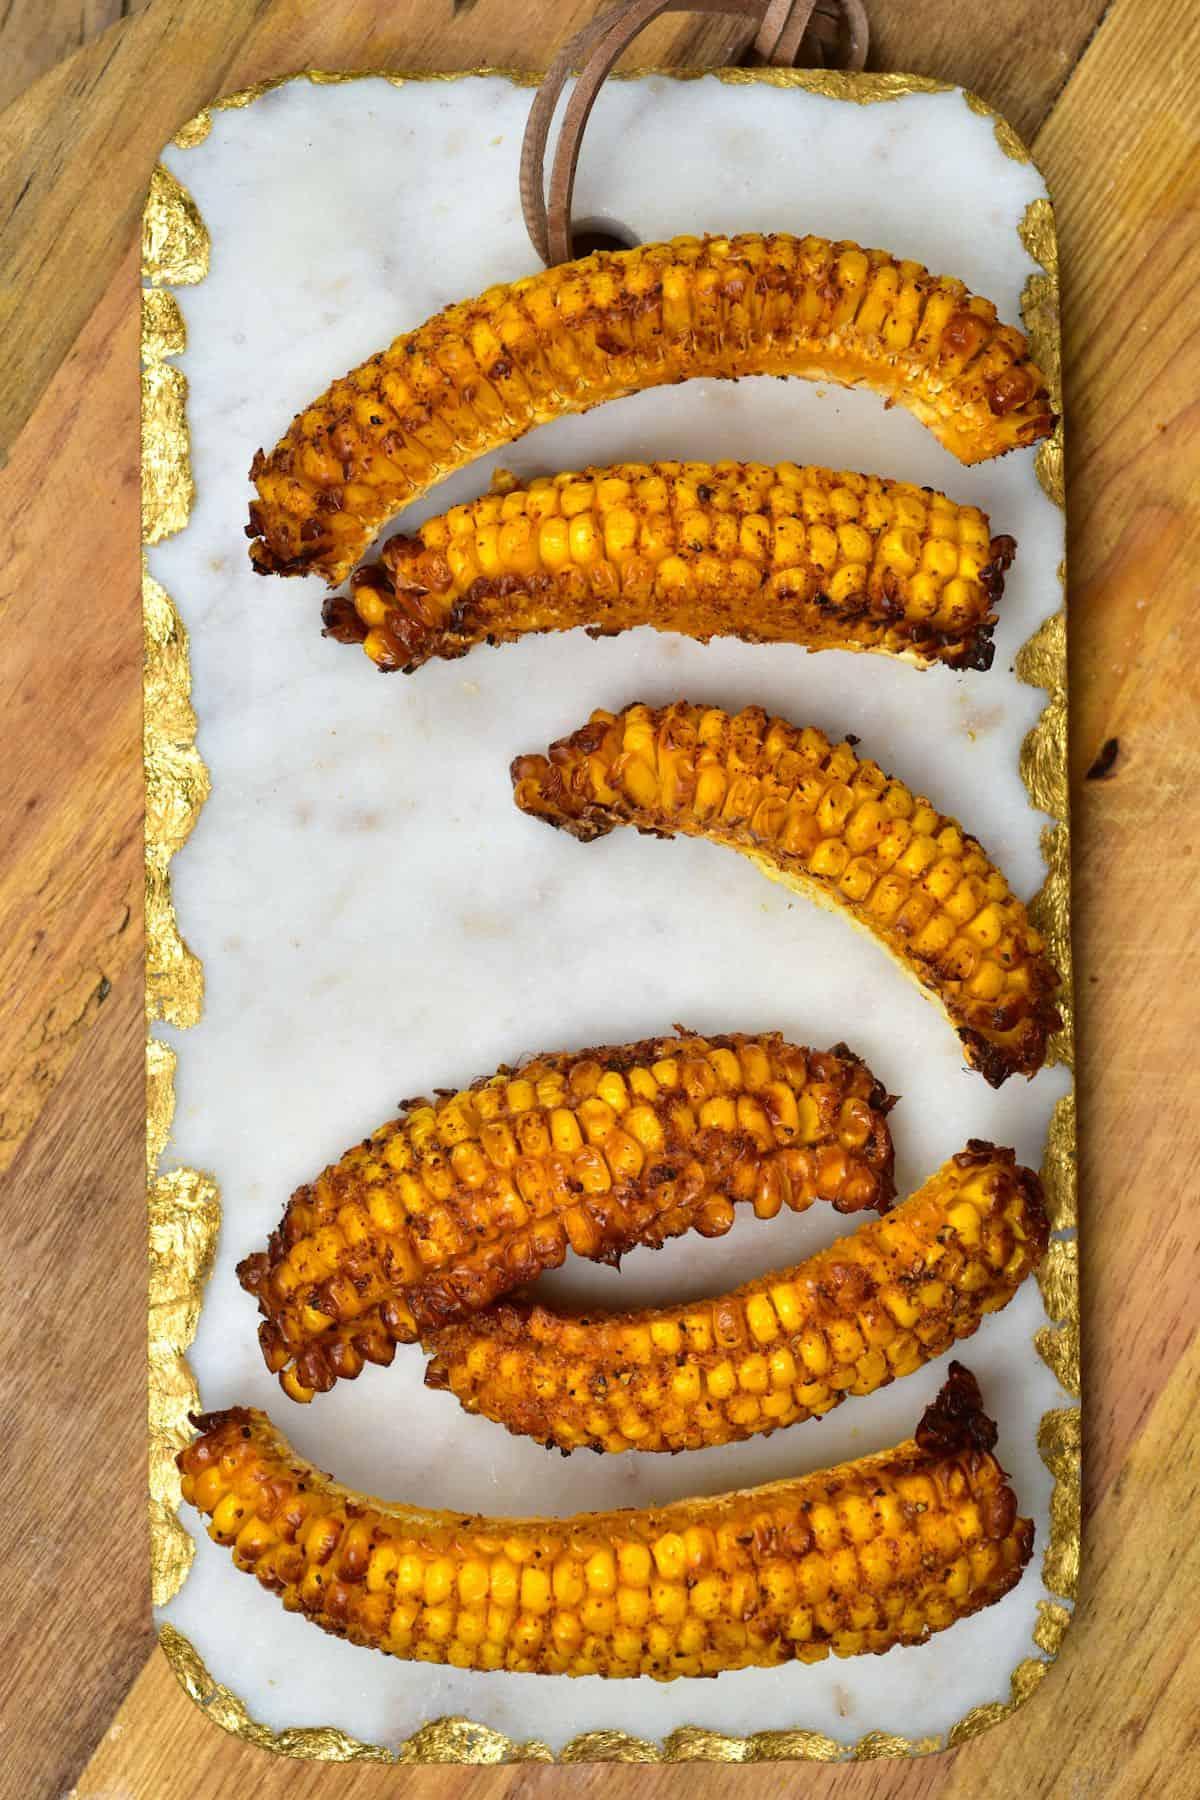 Baked corn ribs on a chopping board